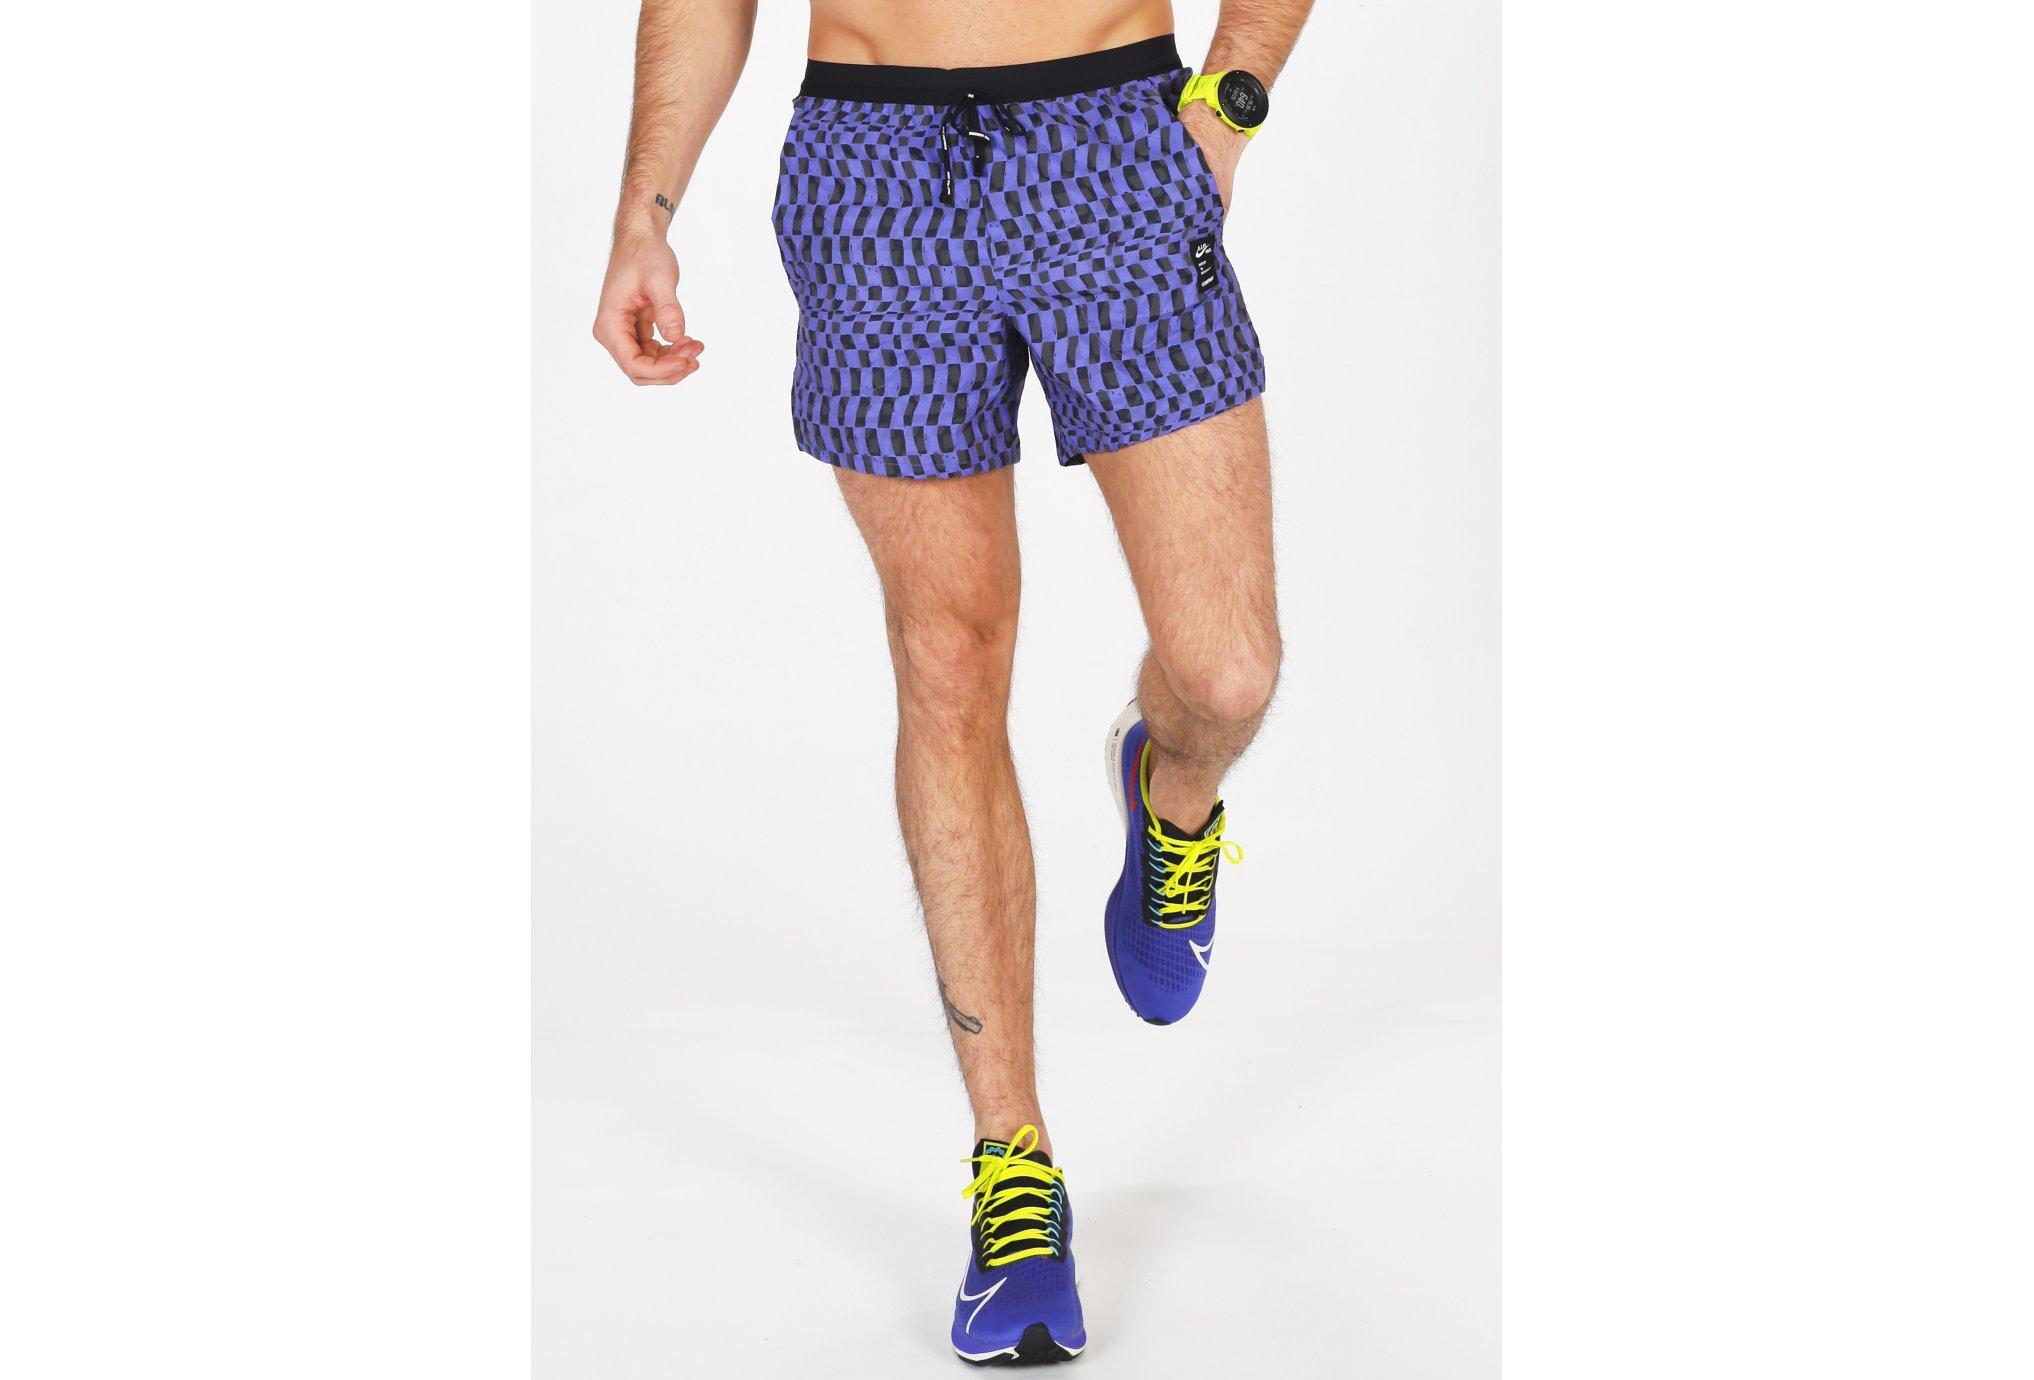 Nike Flex Stride A.I.R. Chaz Bundick M vêtement running homme